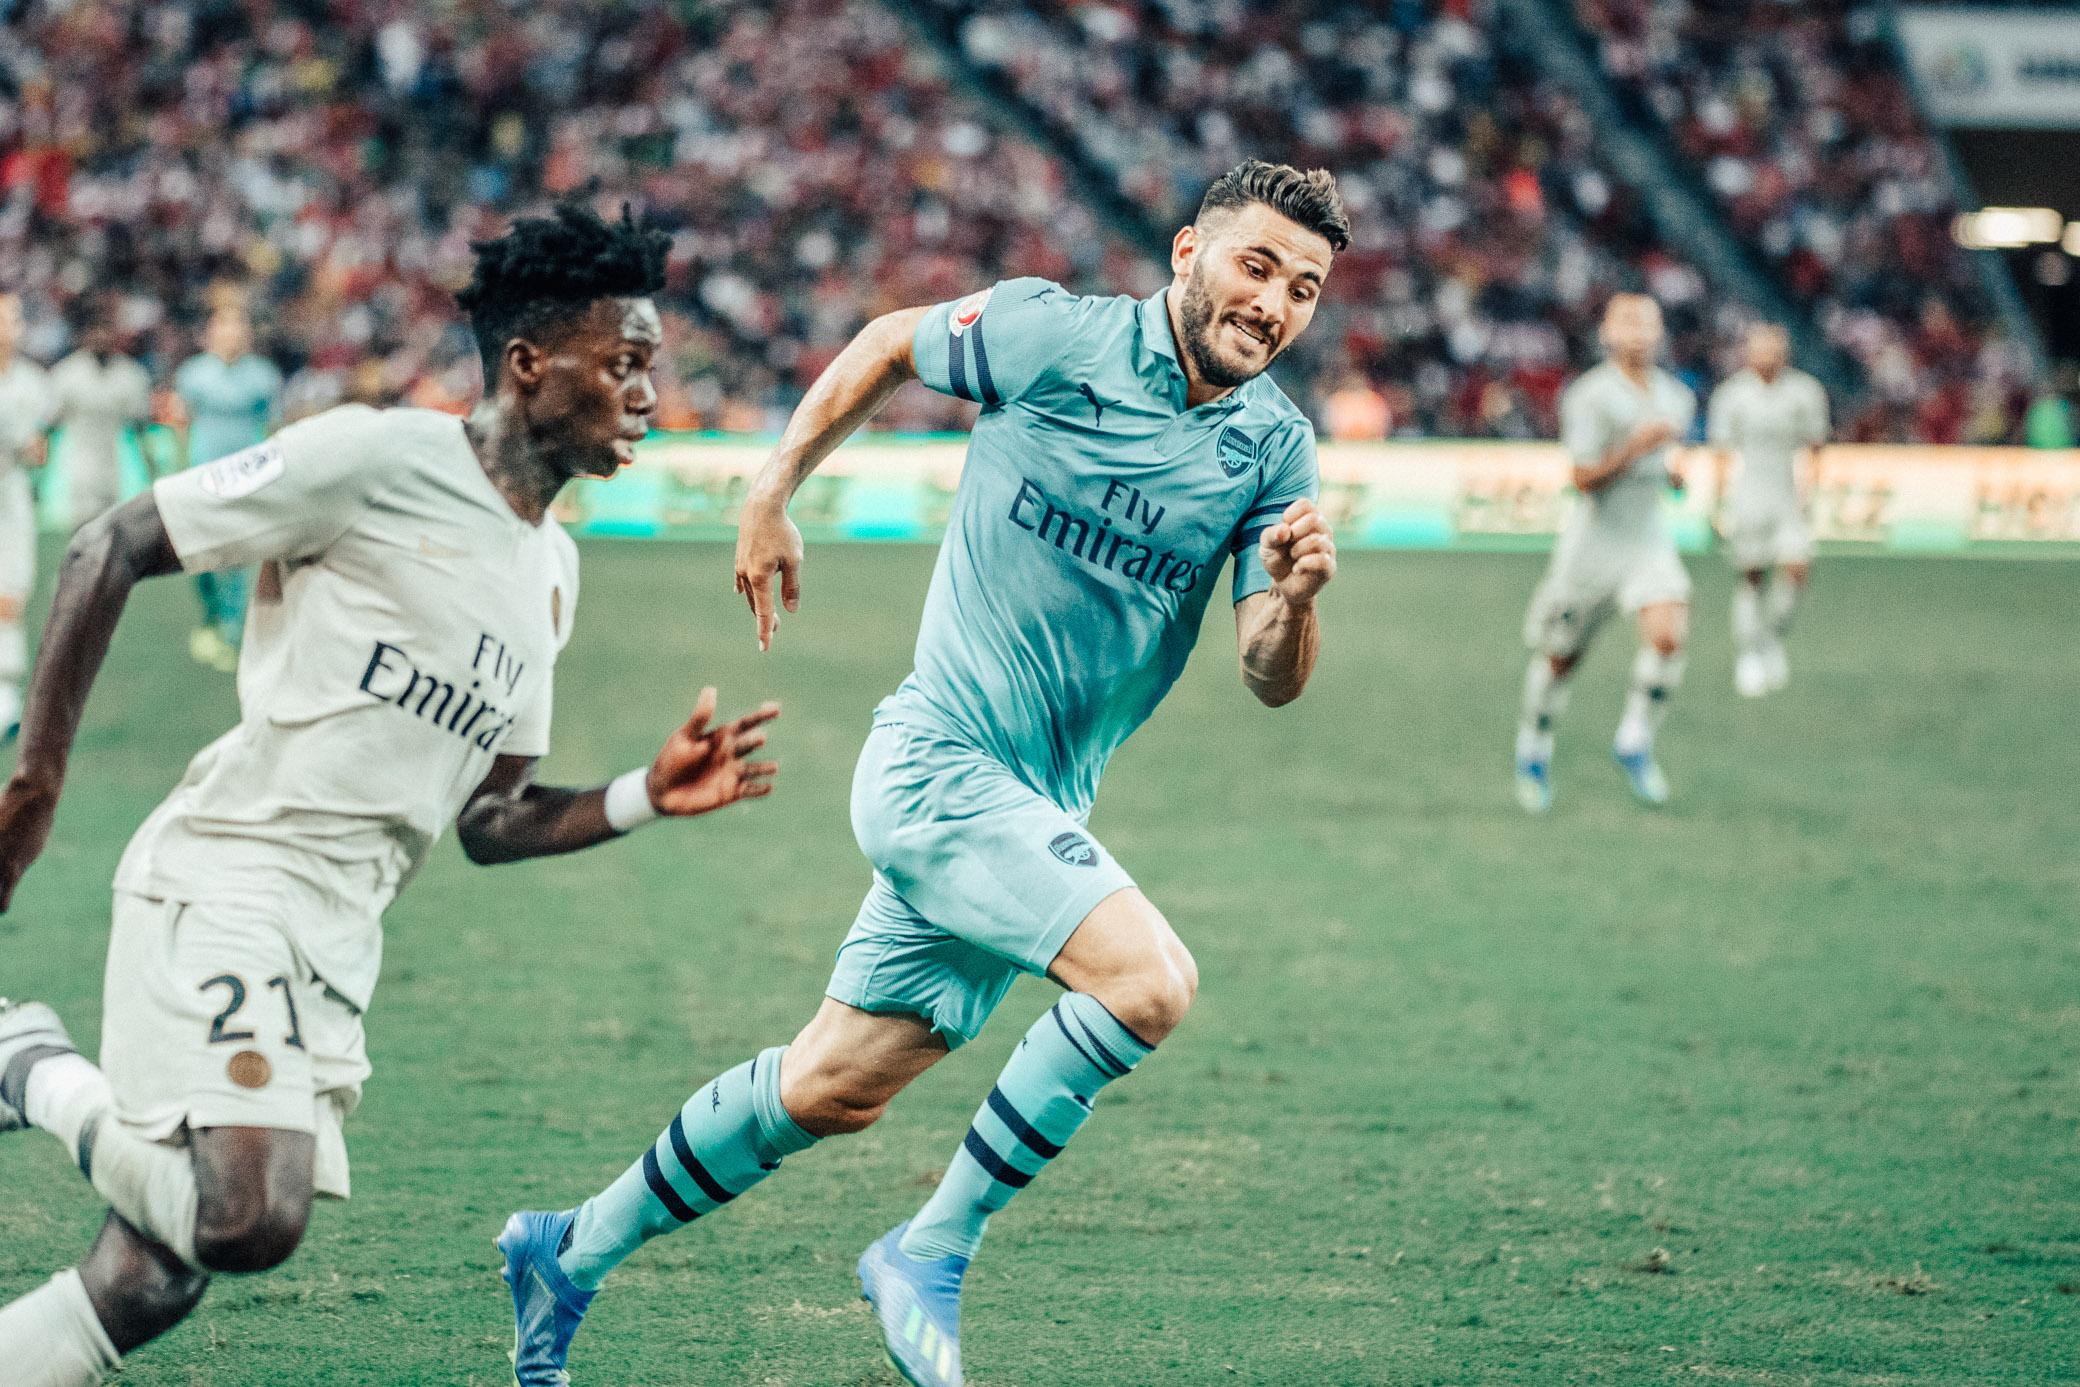 ICC 2018: PSG VS ARSENAL (KOLASINAC)